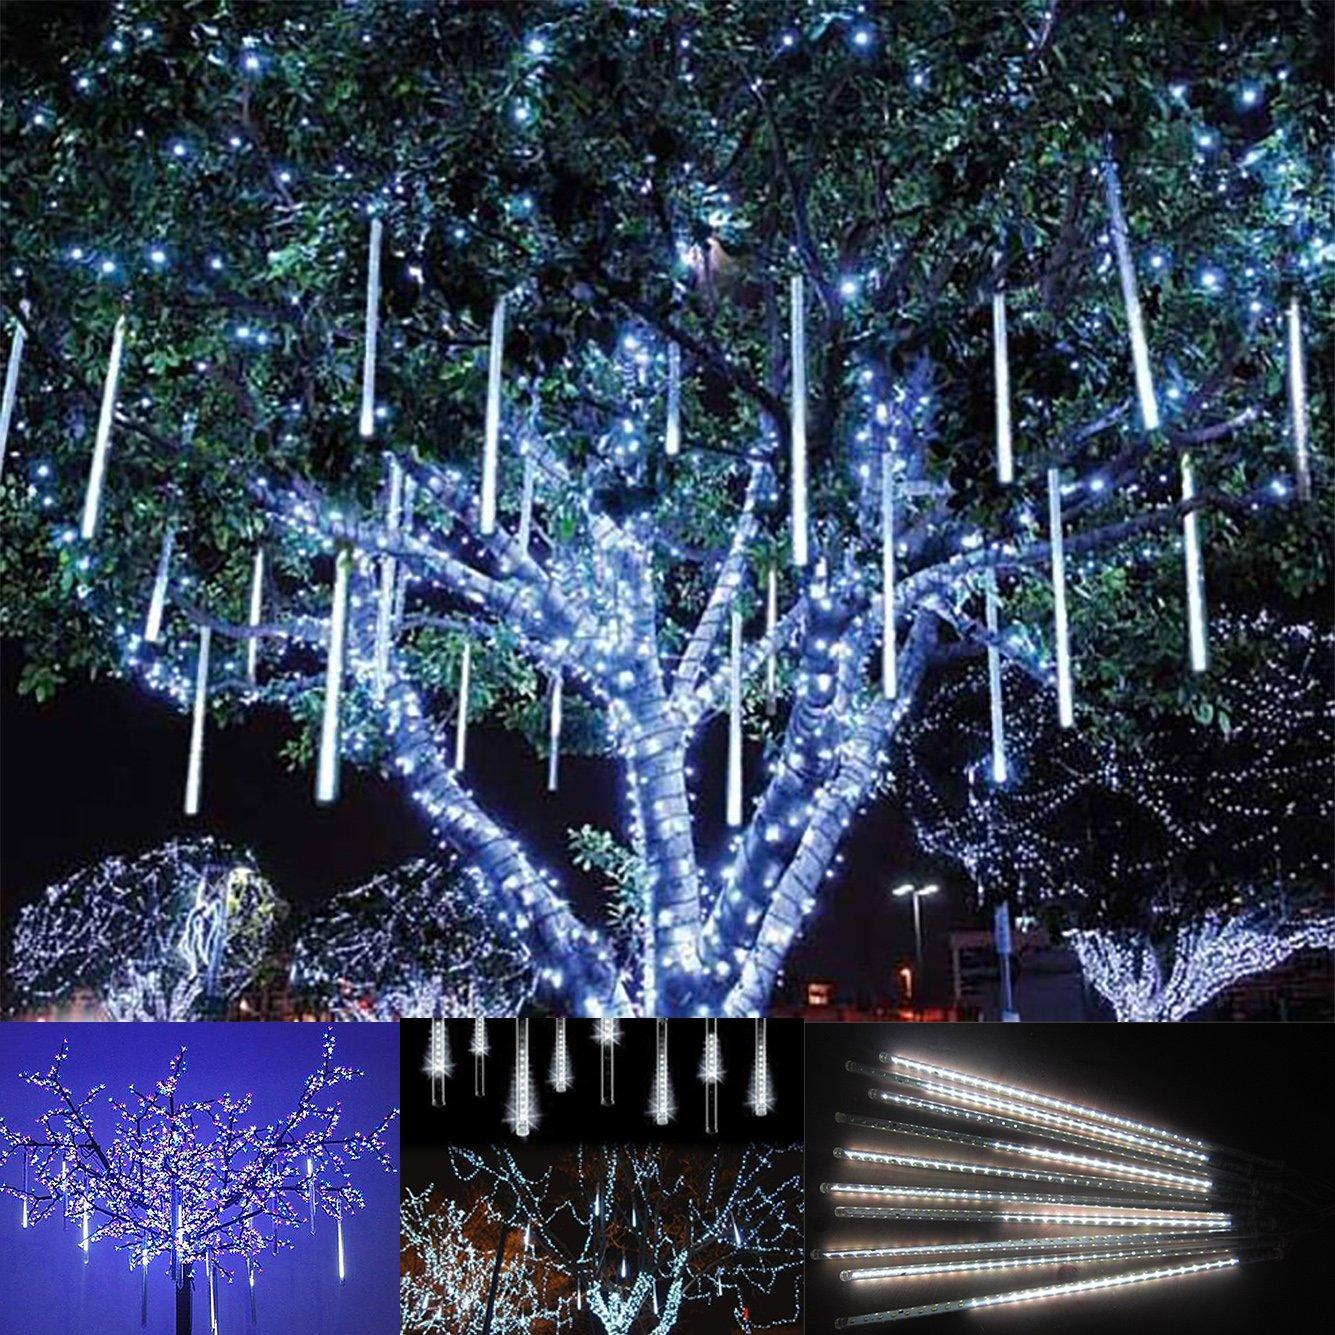 luce natale led pioggia nevicata - victorstar 30cm 10 tubi 360 led ... - Illuminazione Alberi Natale